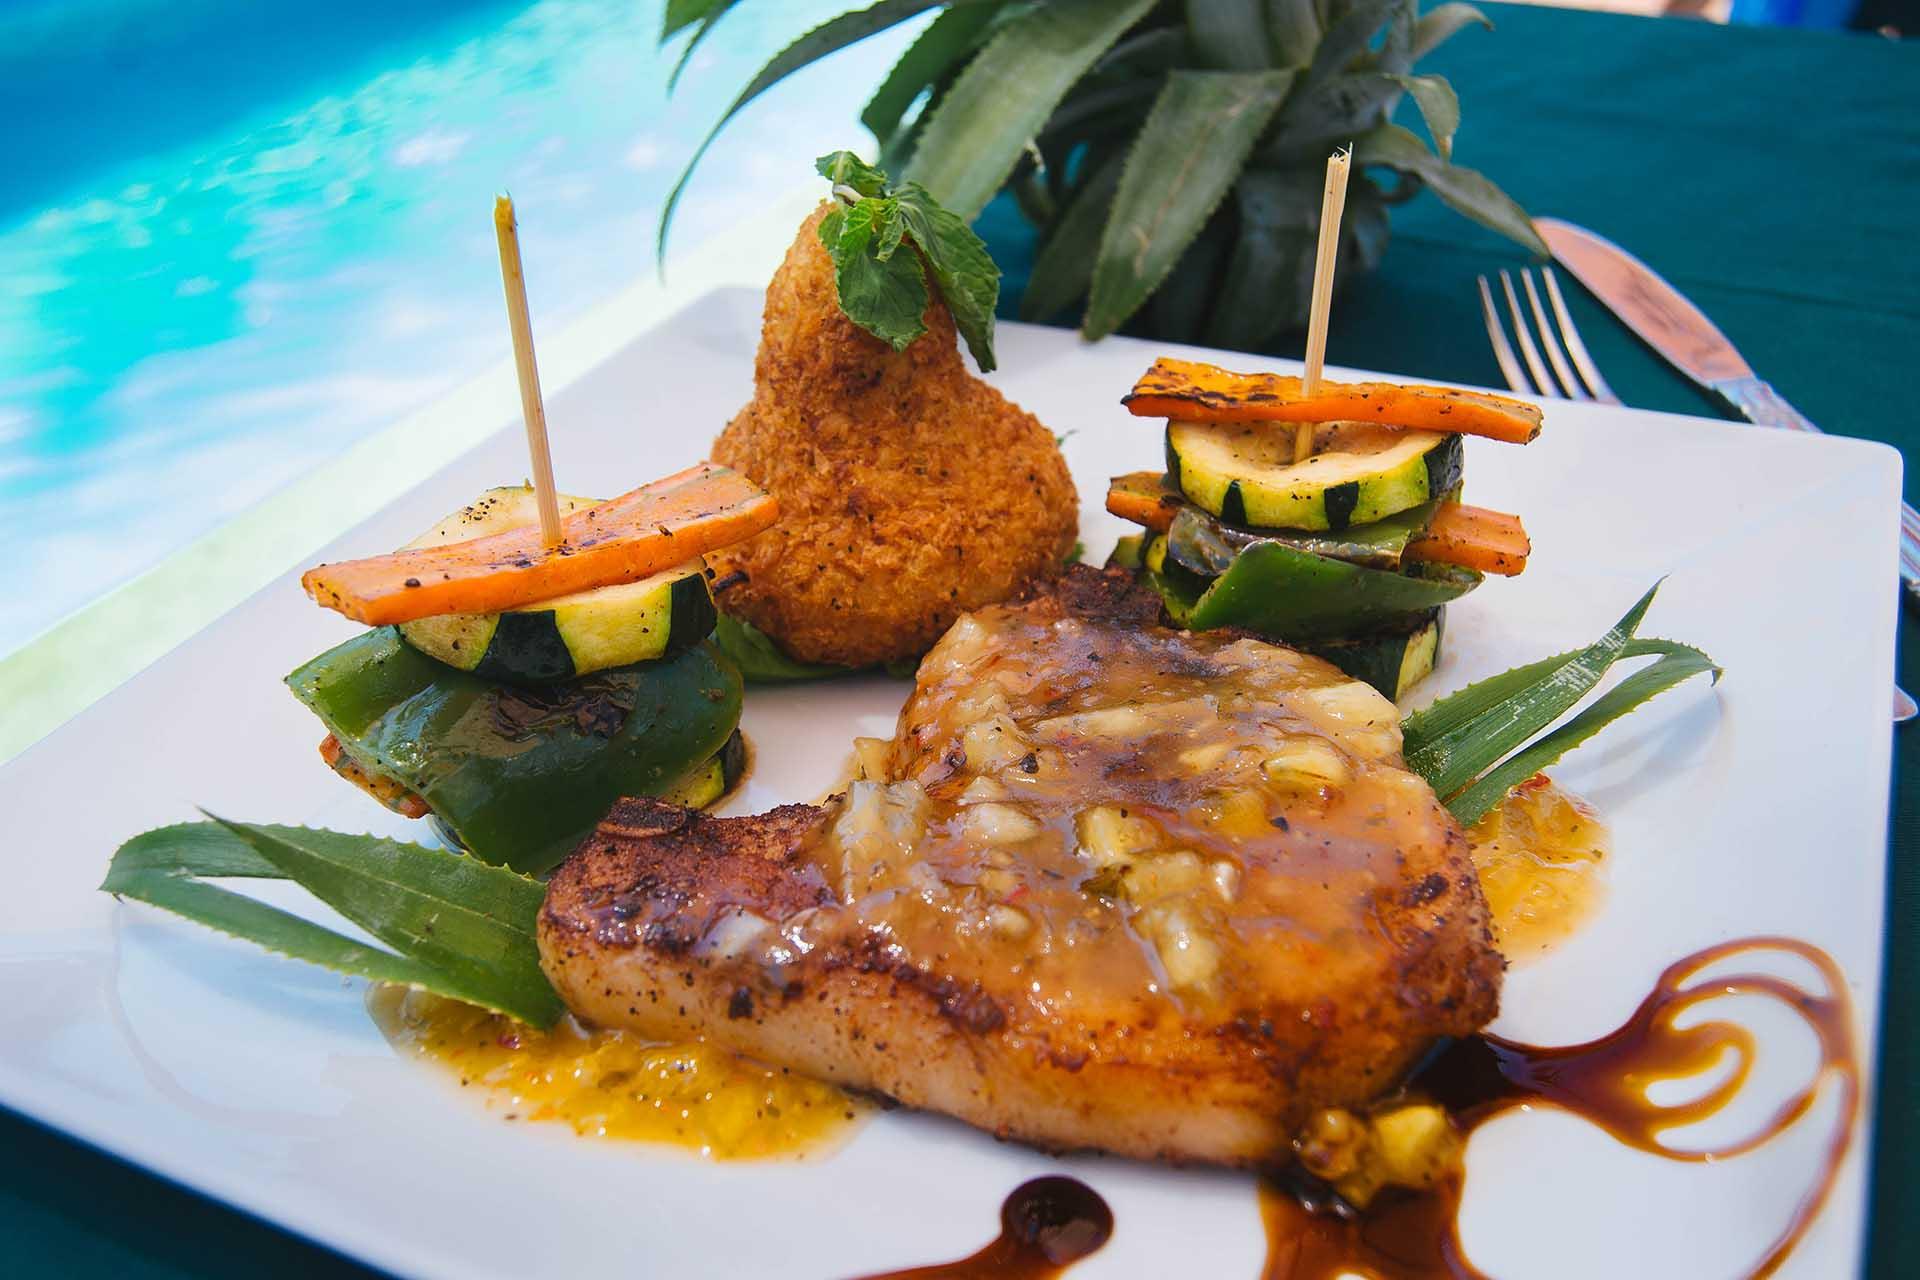 Pan-seared-Pork-Chops-with-Pineapple-Salsa